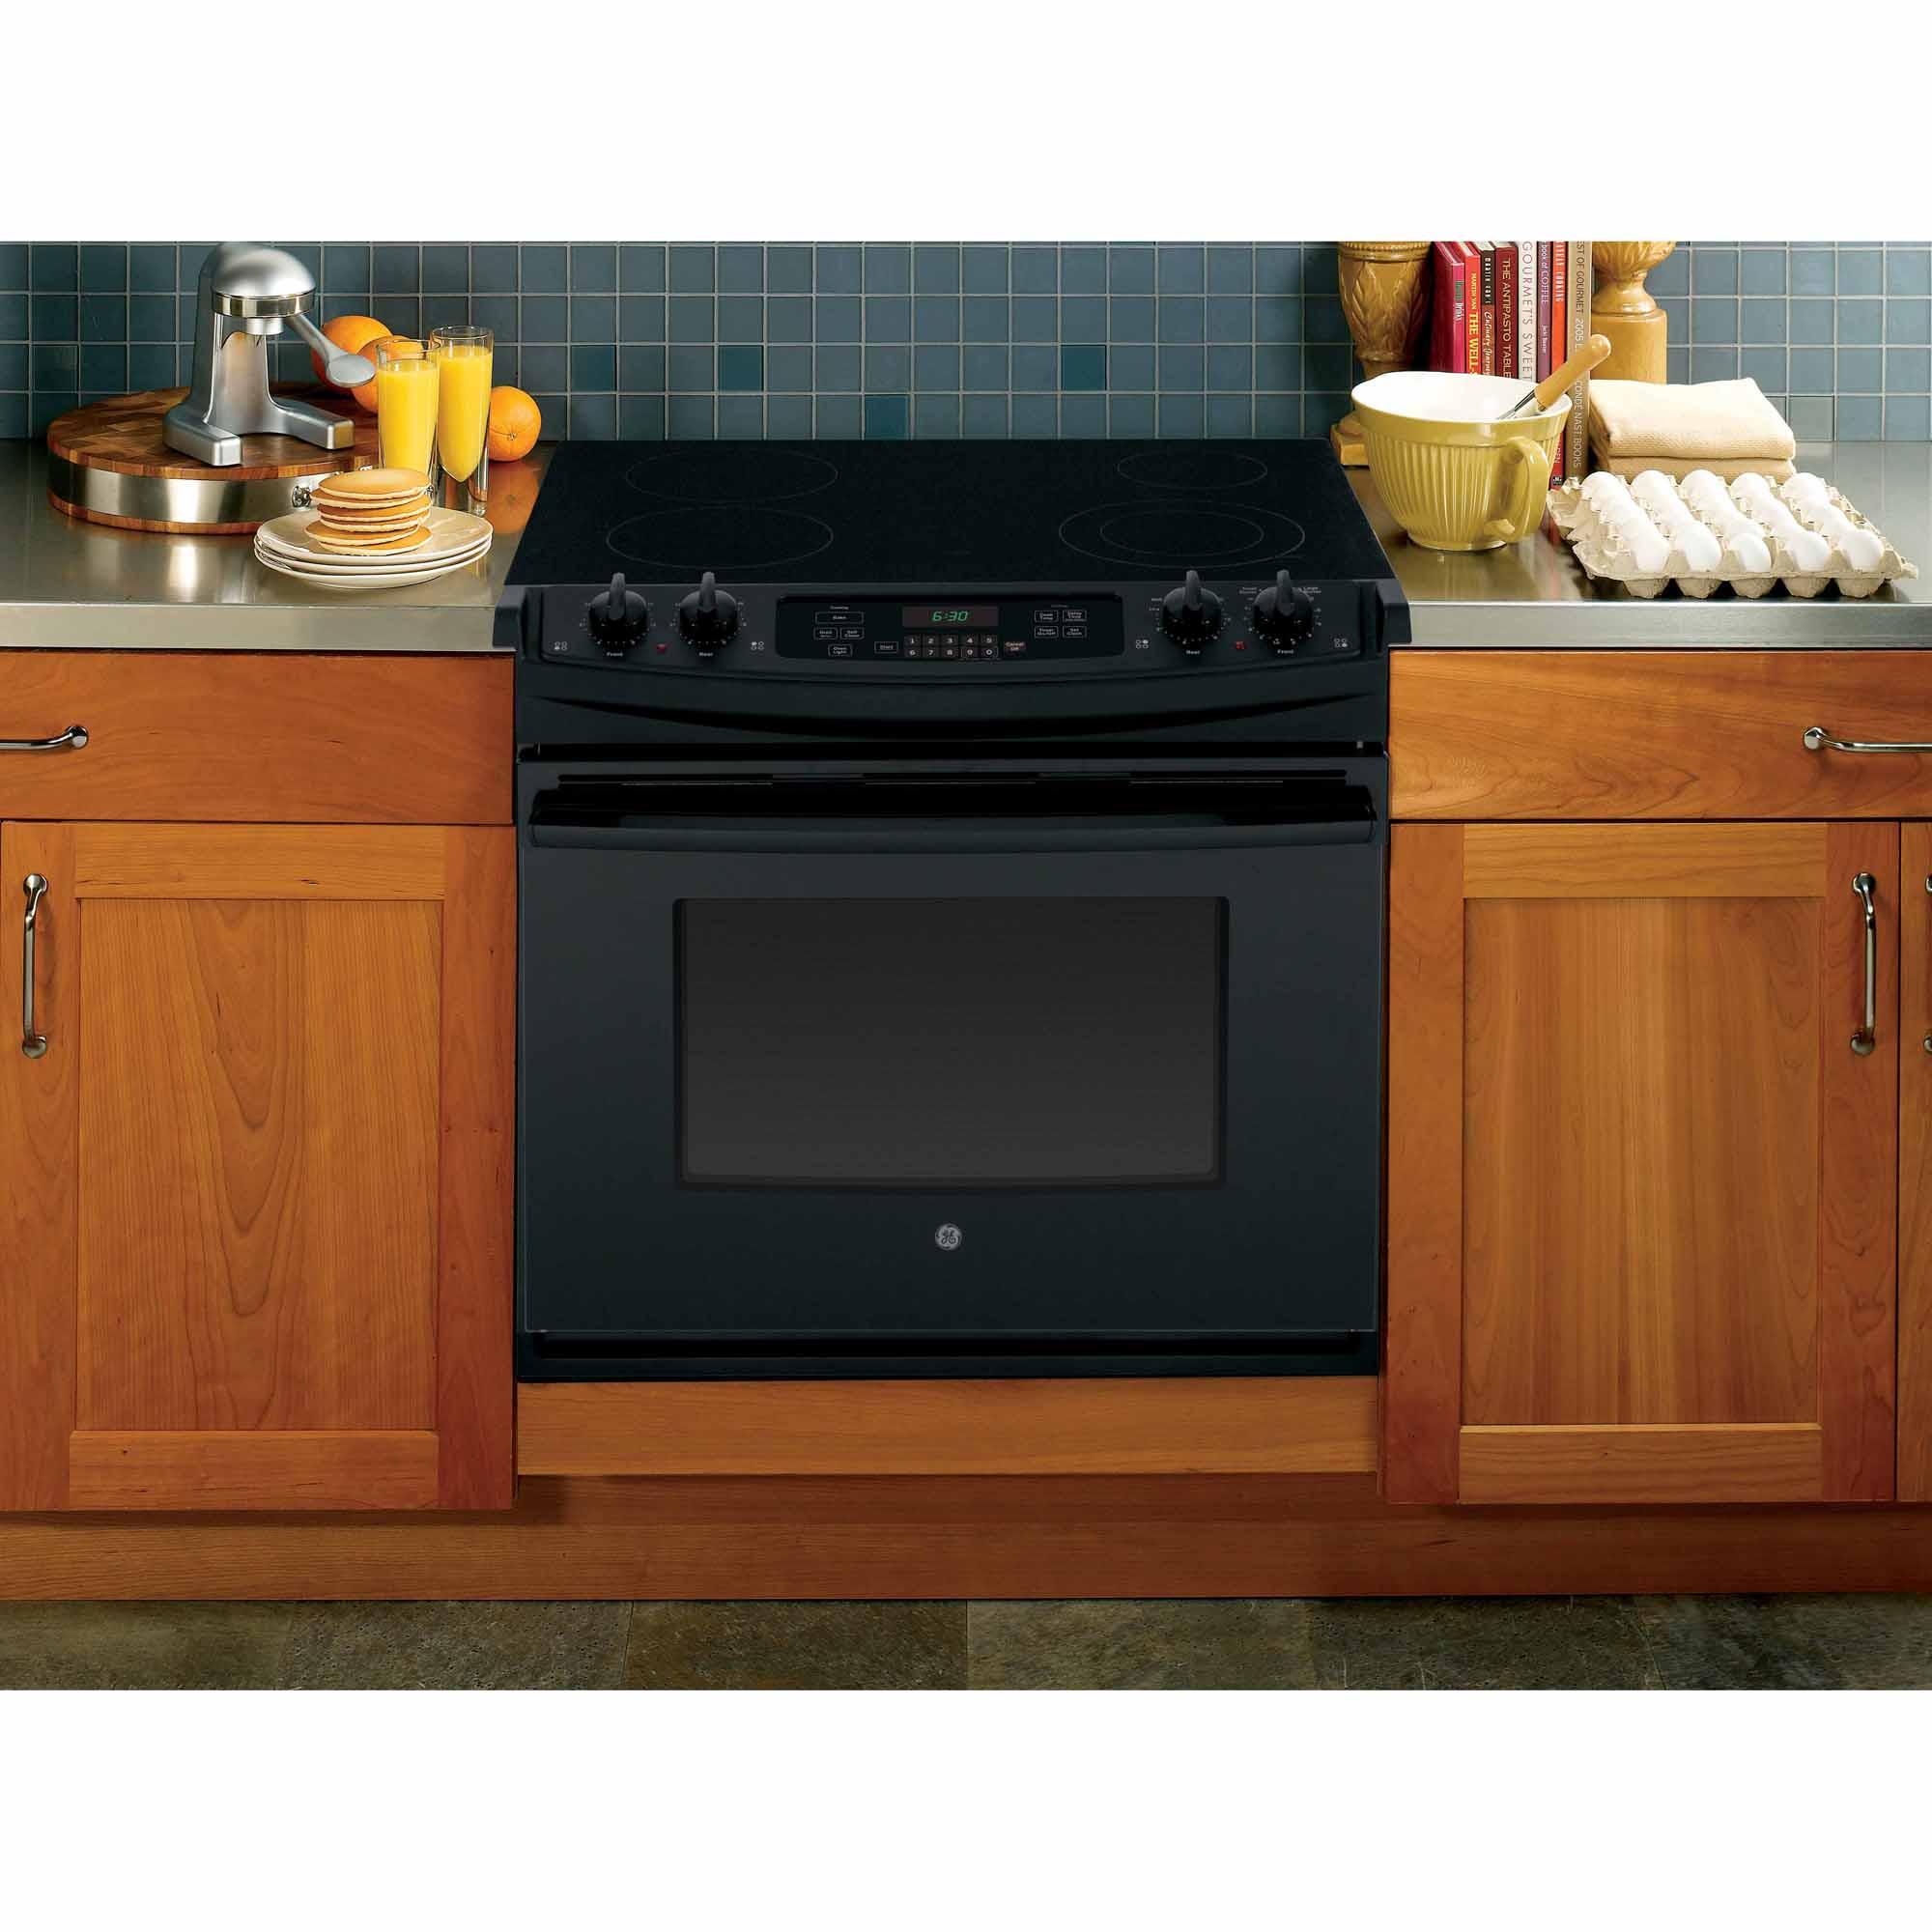 "GE Appliances JD630DFBB 30"" Drop-In Electric Range - Black"